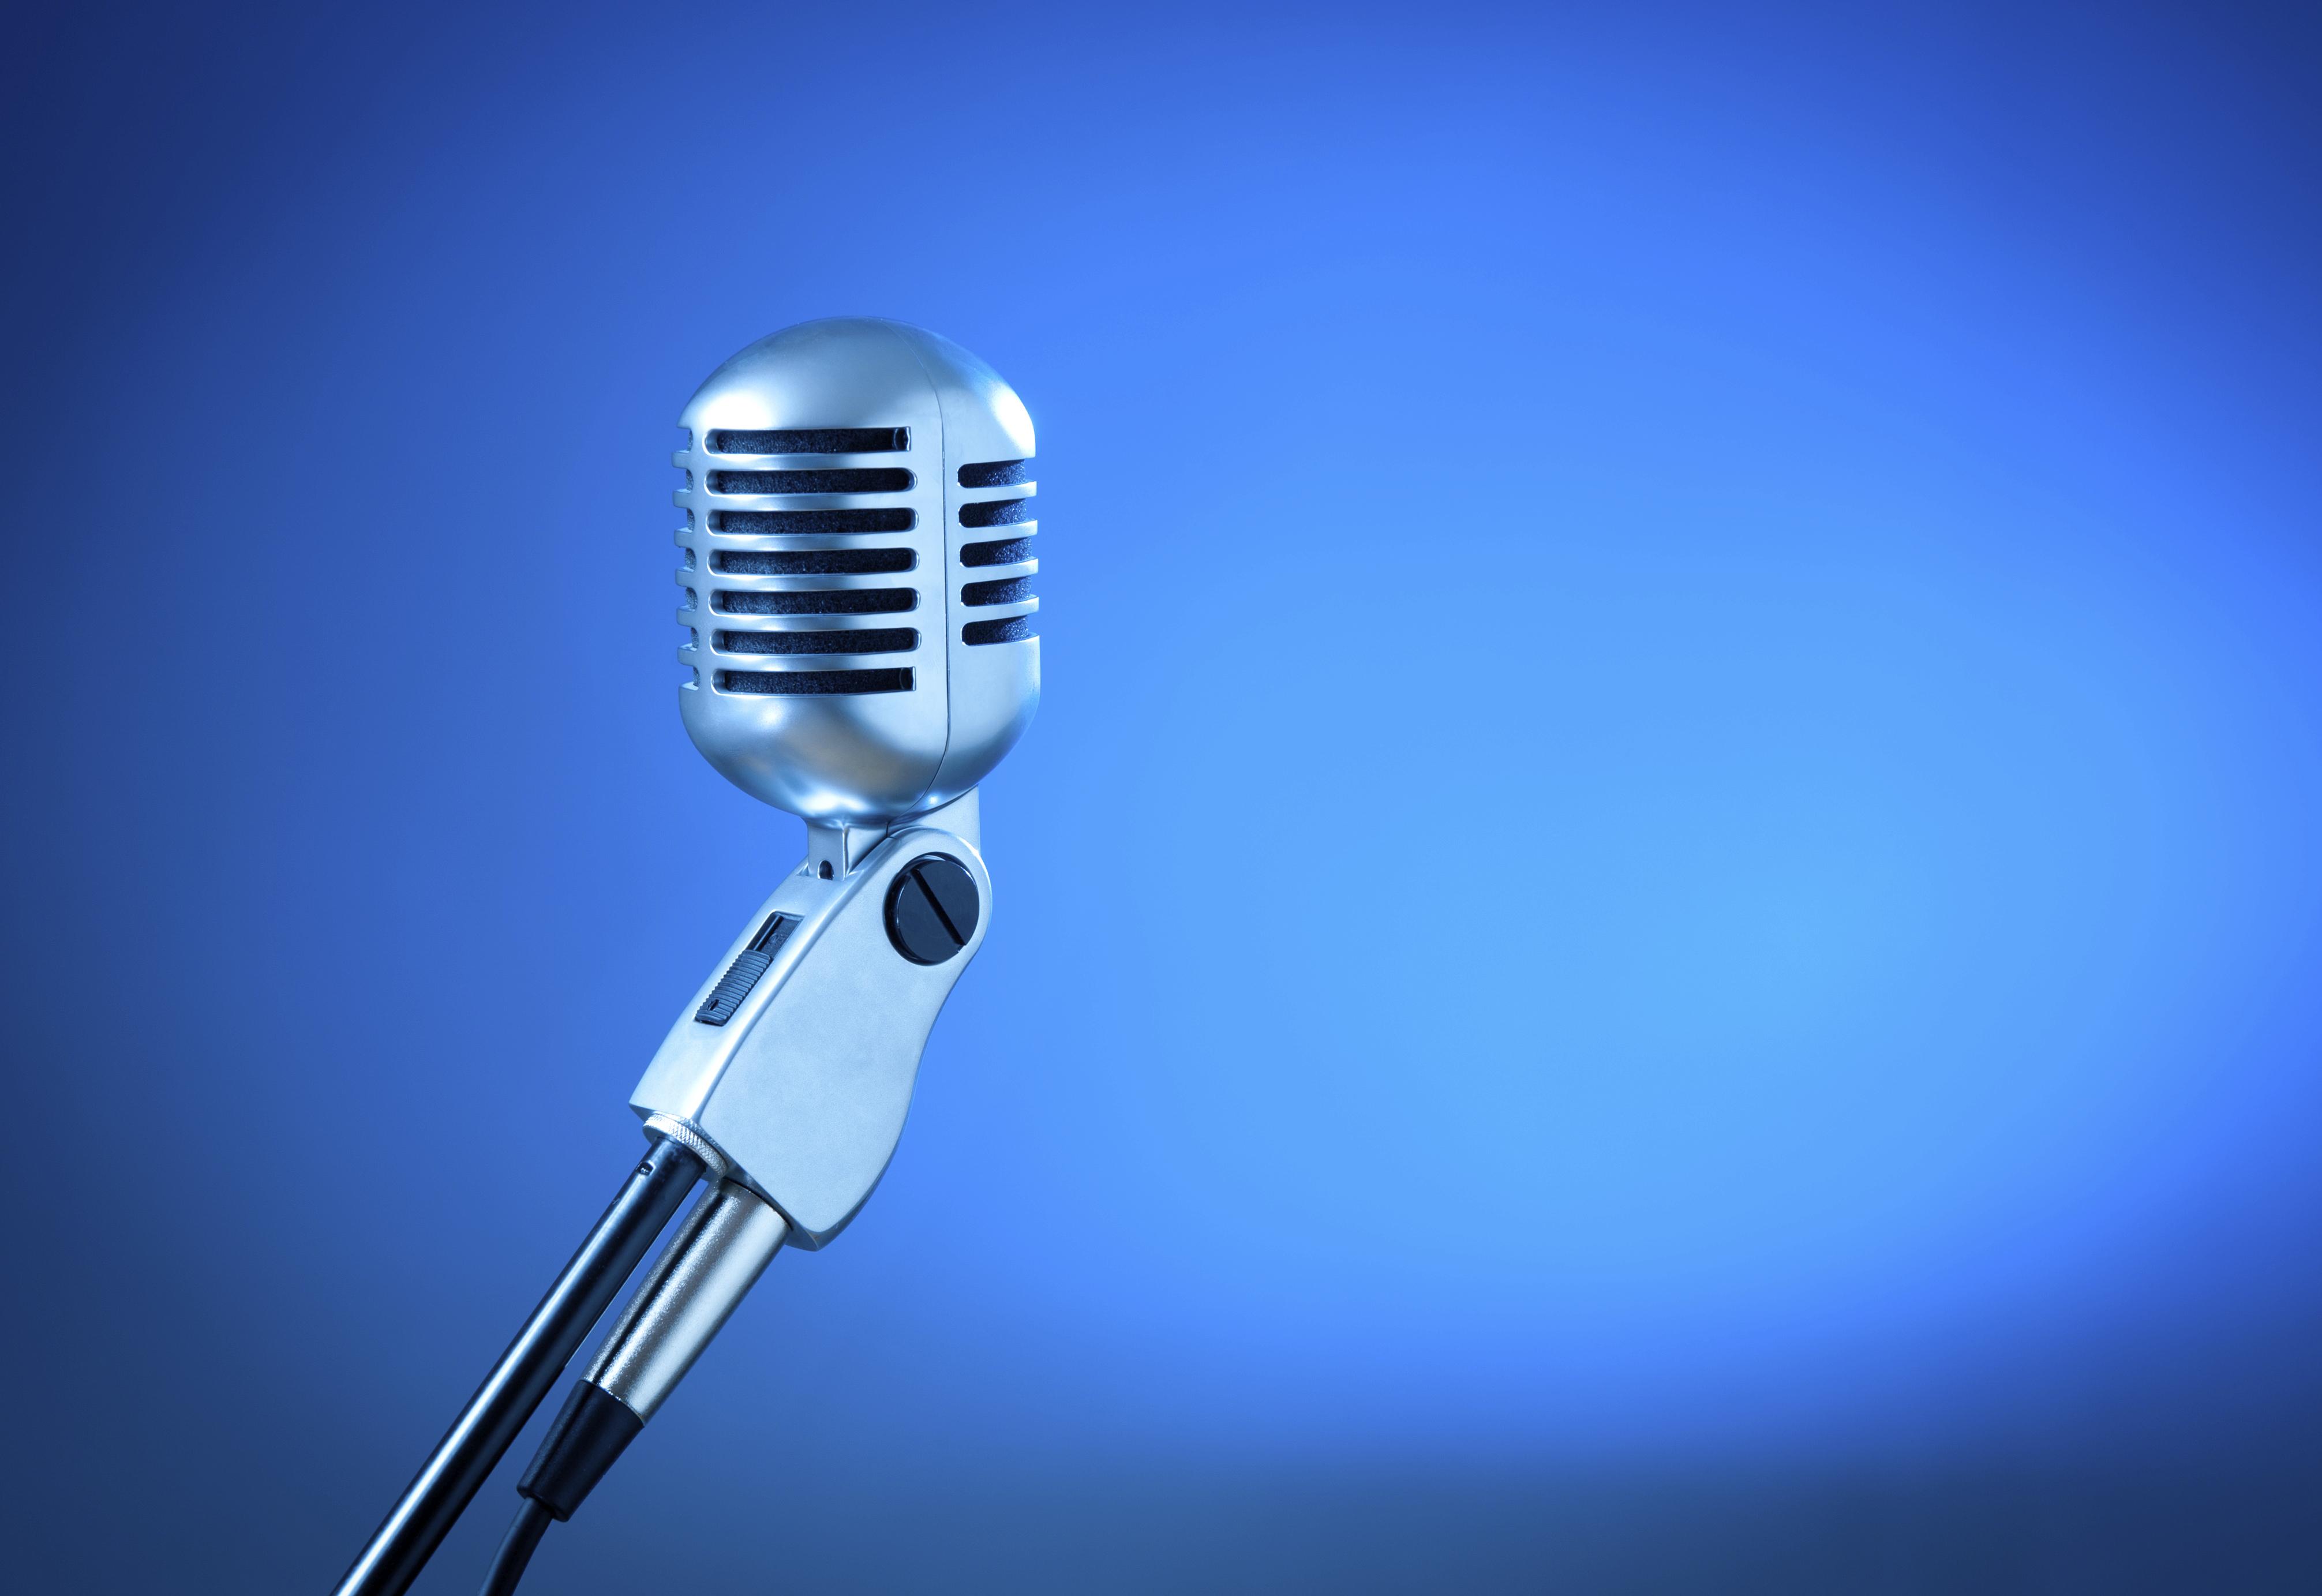 Radio Host Turned Presenter Extraordinaire